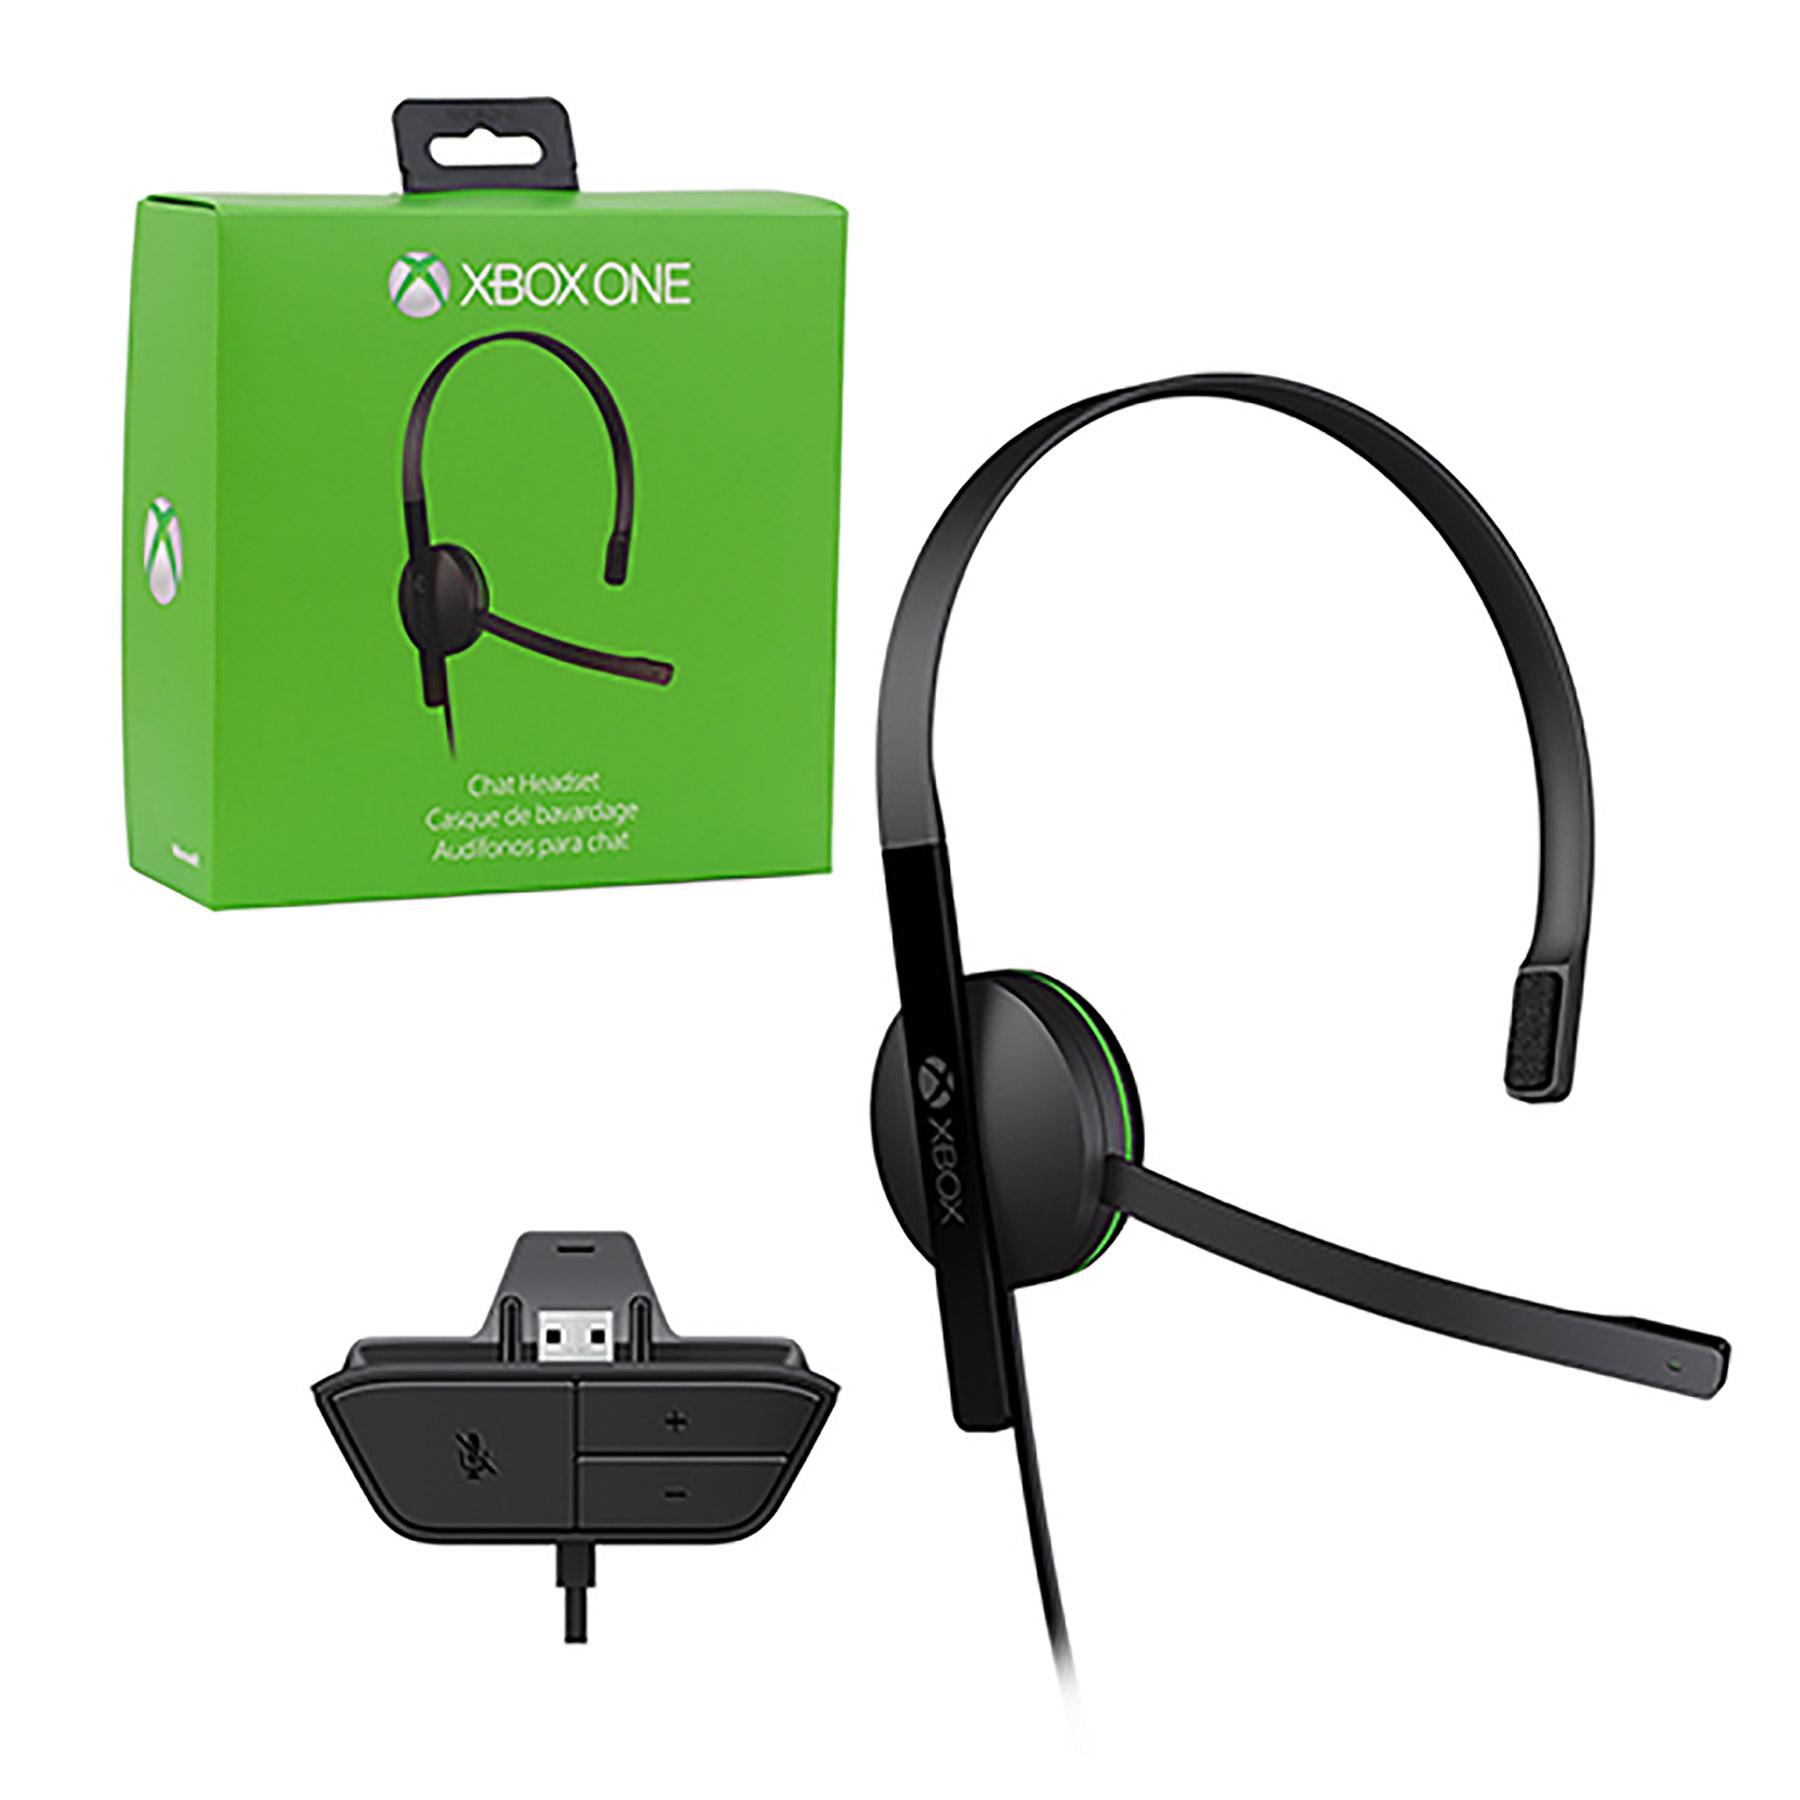 Xbox One Headset Mic Wiring Diagram | Wiring Diagram - Xbox One Headset Wiring Diagram